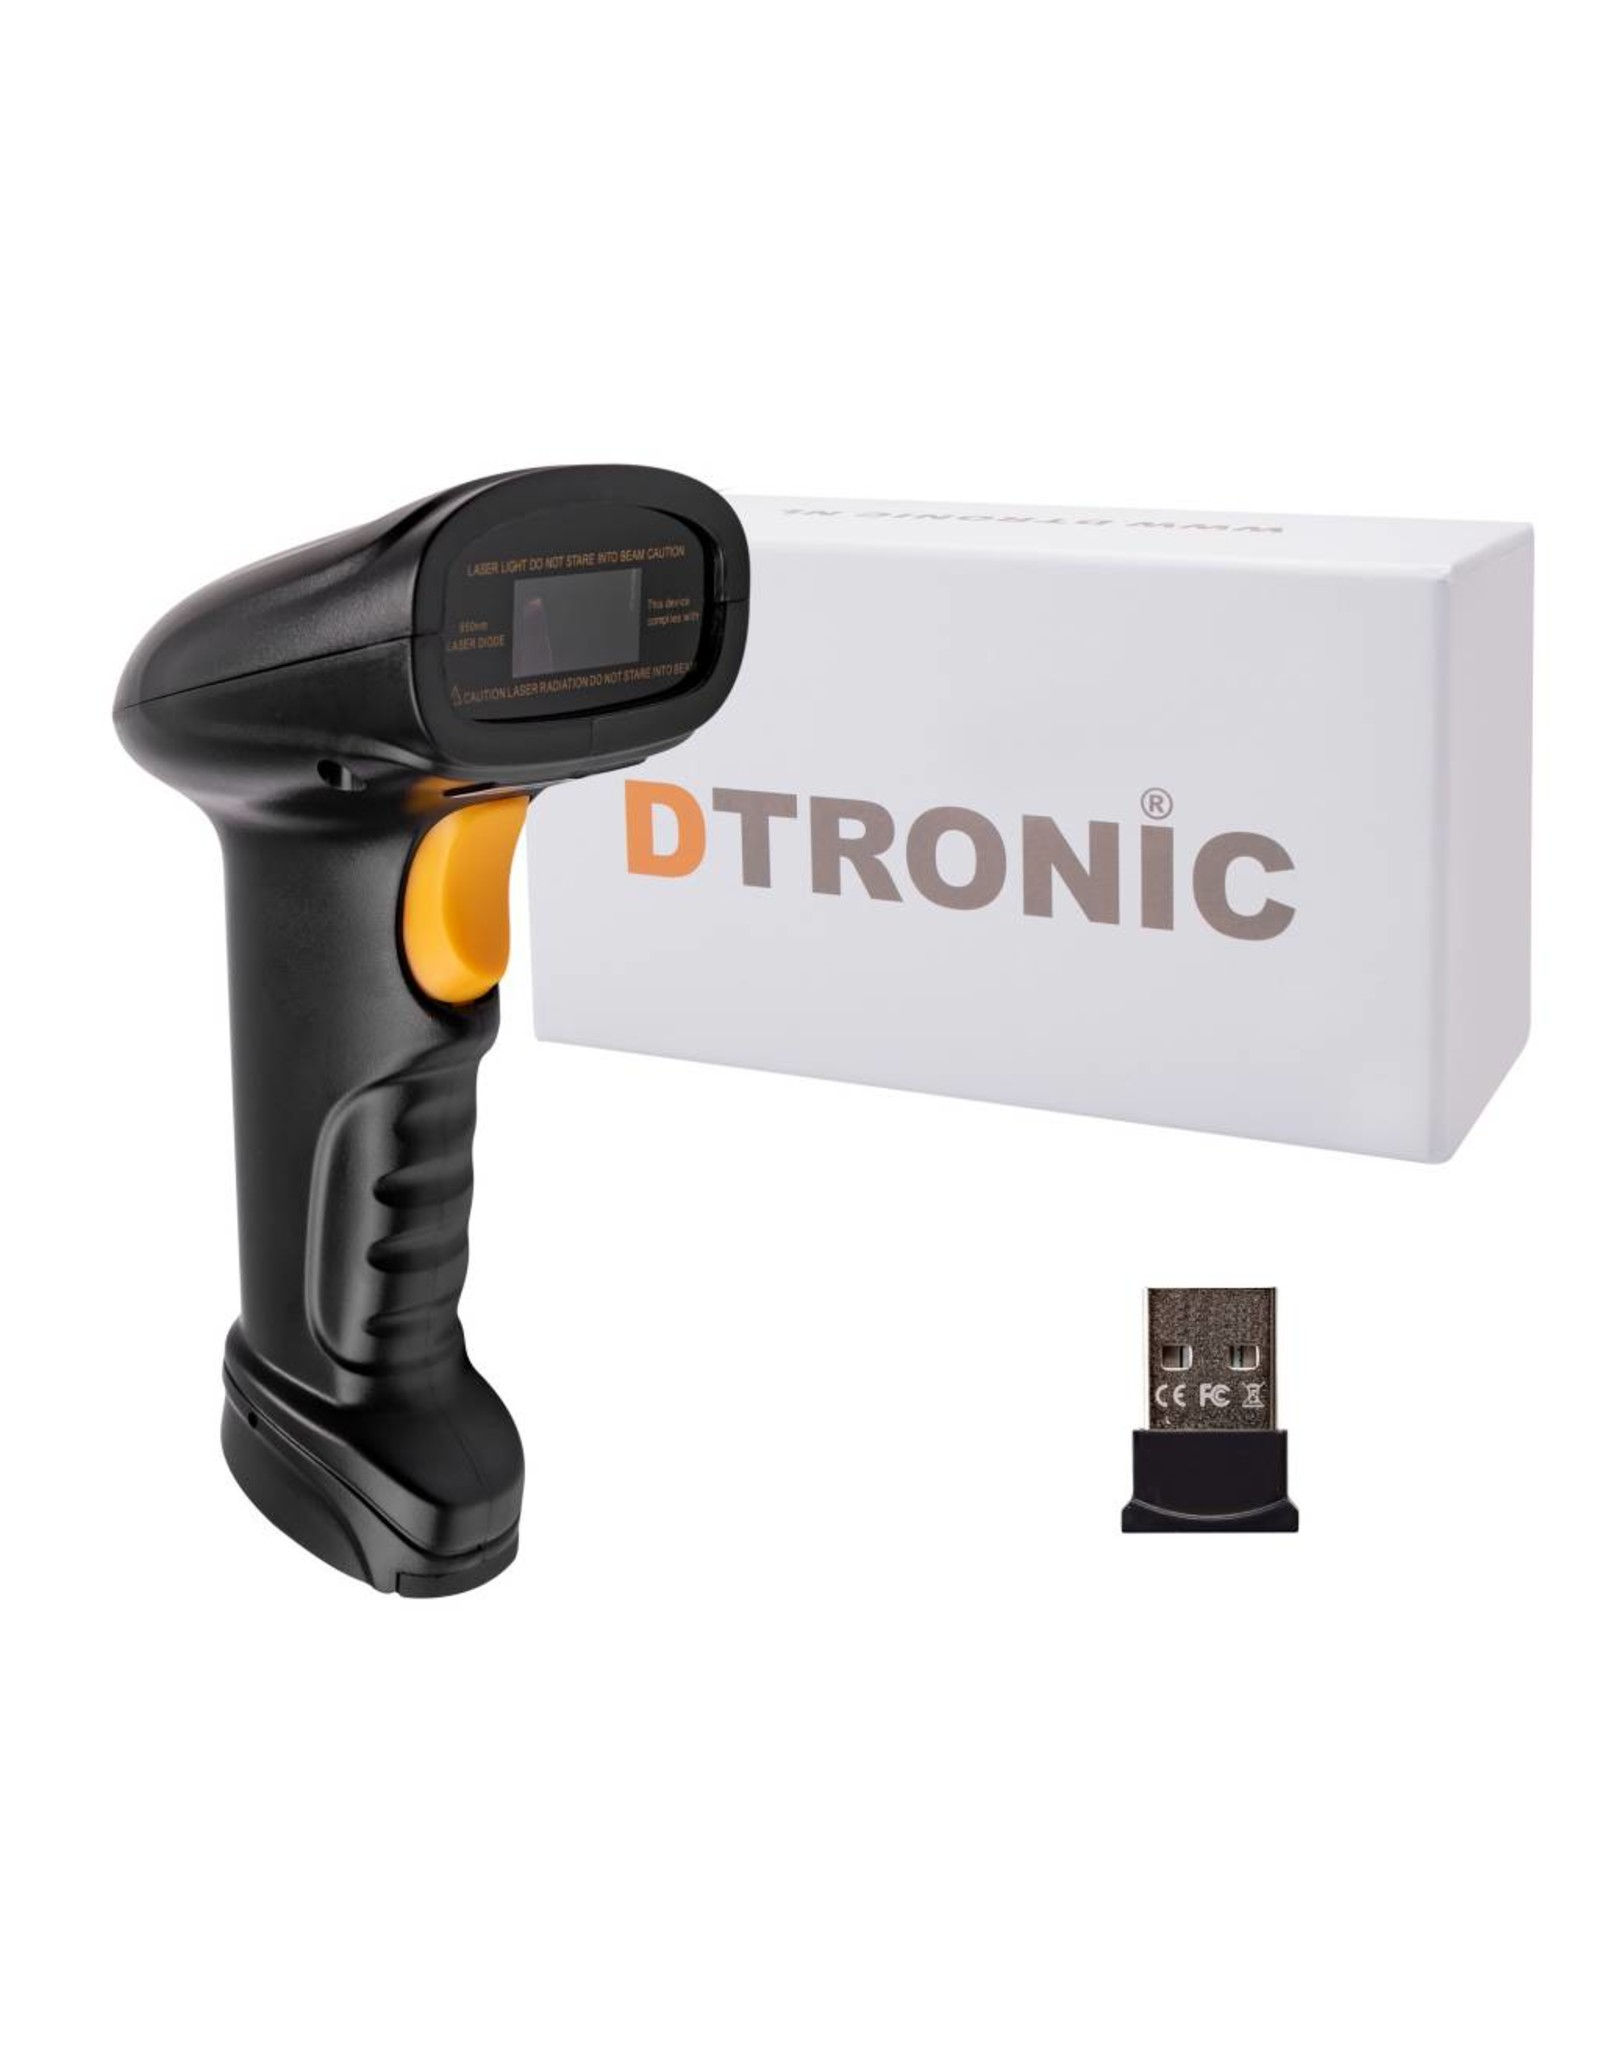 DTRONIC DTRONIC - W910